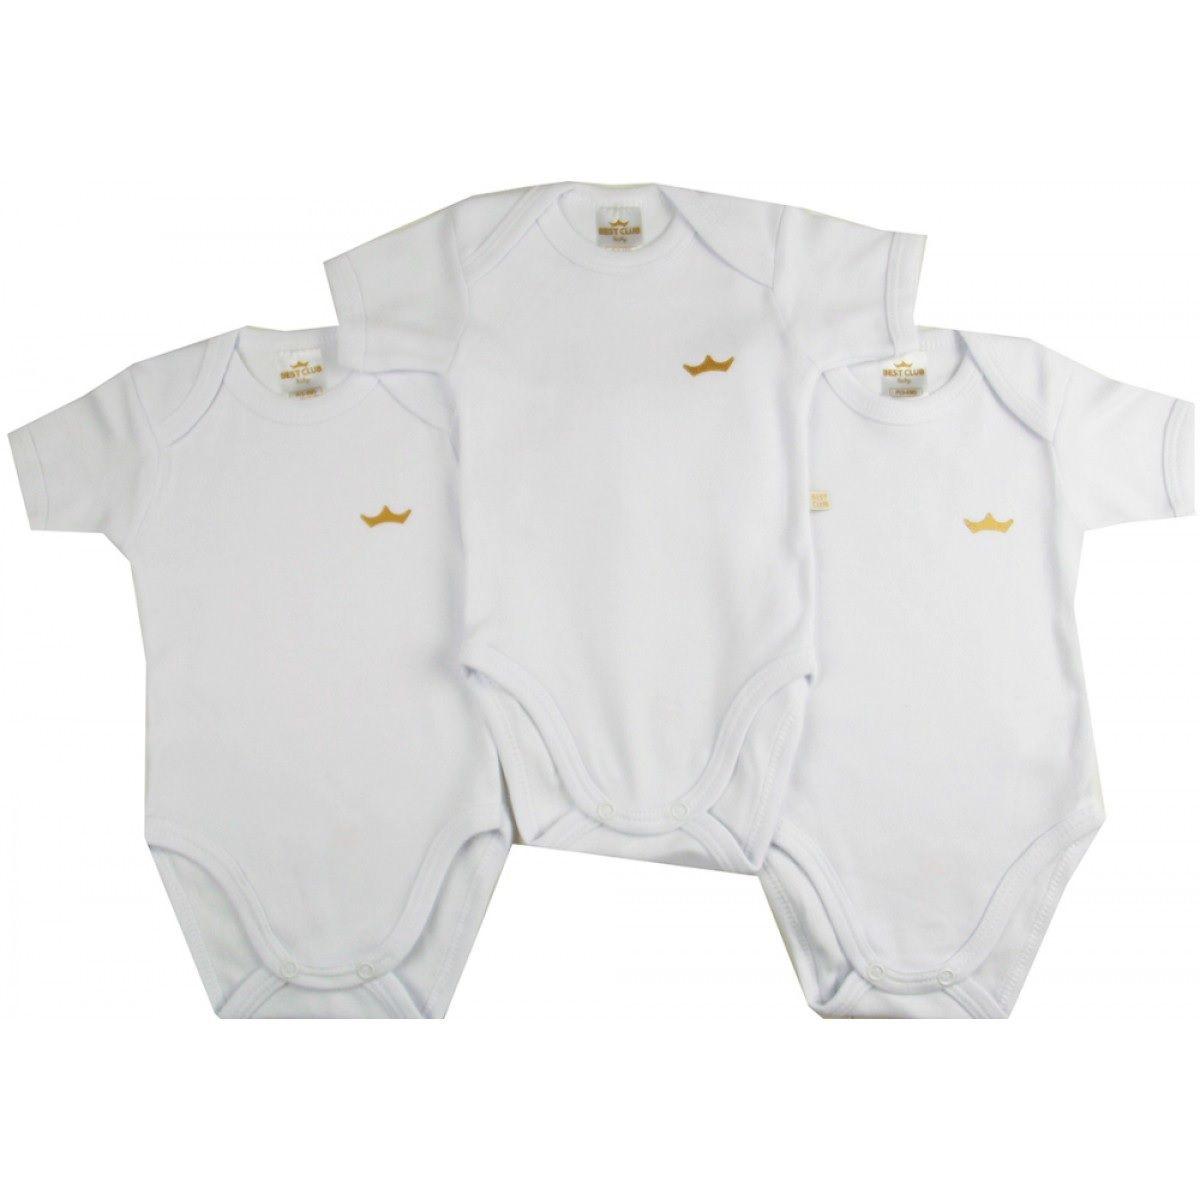 Kit 3 Bodies Branco - Best Club